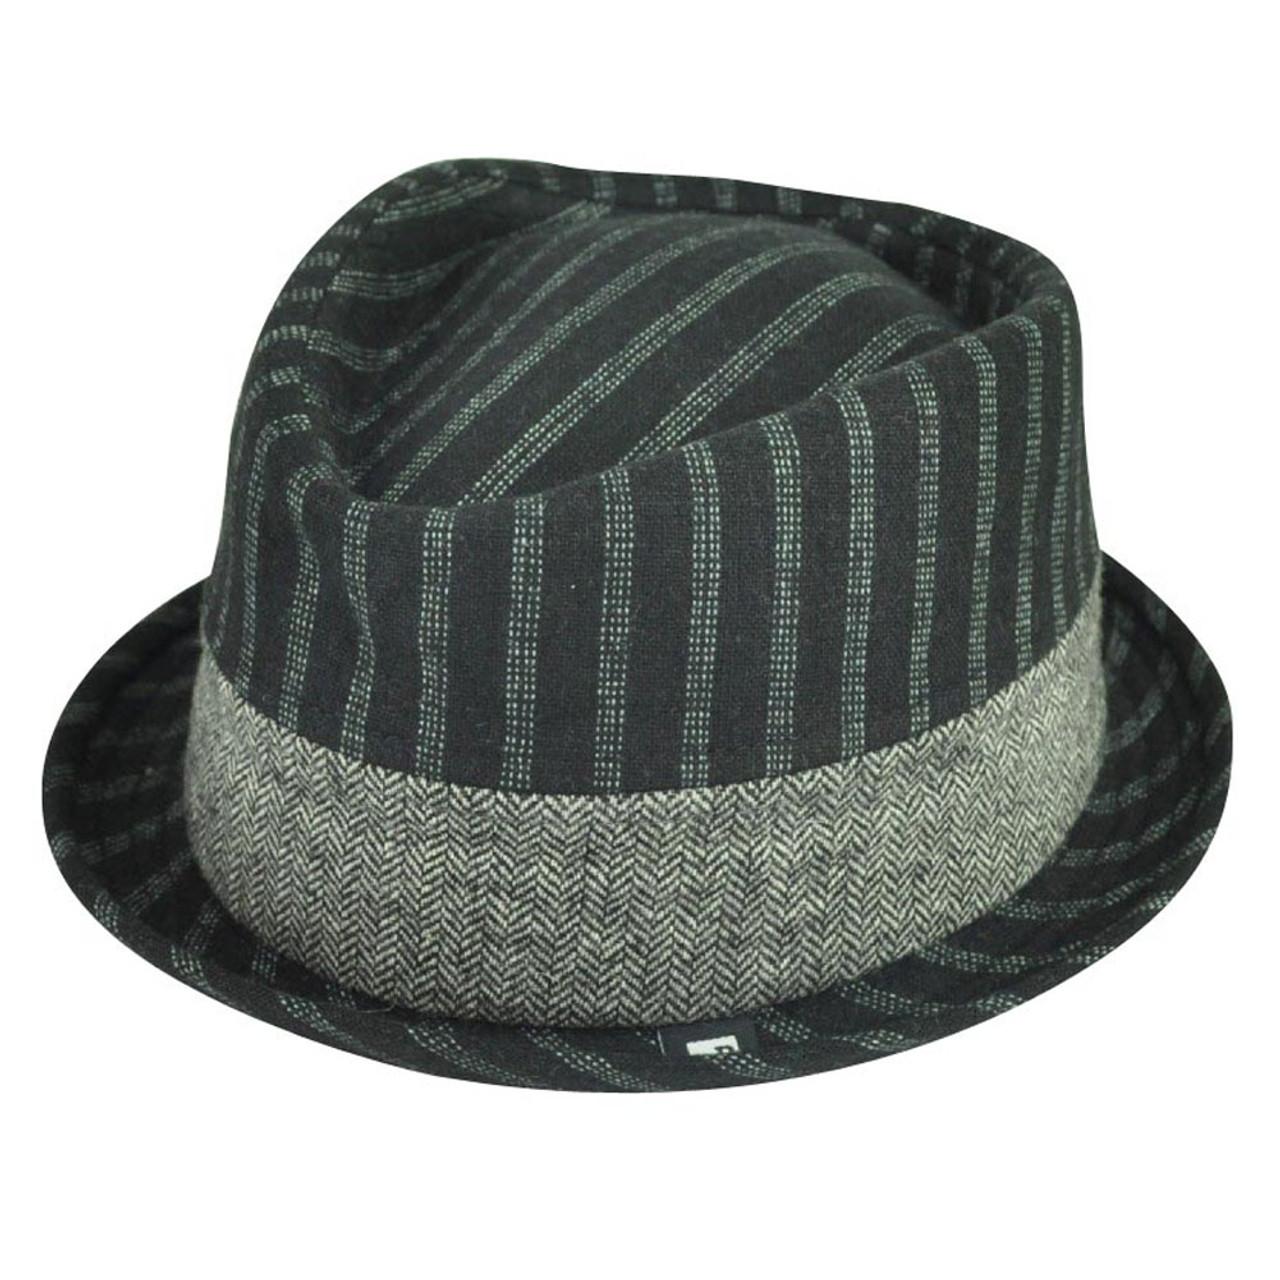 bd05c740aac10d Block Headwear Brand Pinstripe Herringbone Blk Fedora Stetson Trilby Hat  Medium - Cap Store Online.com